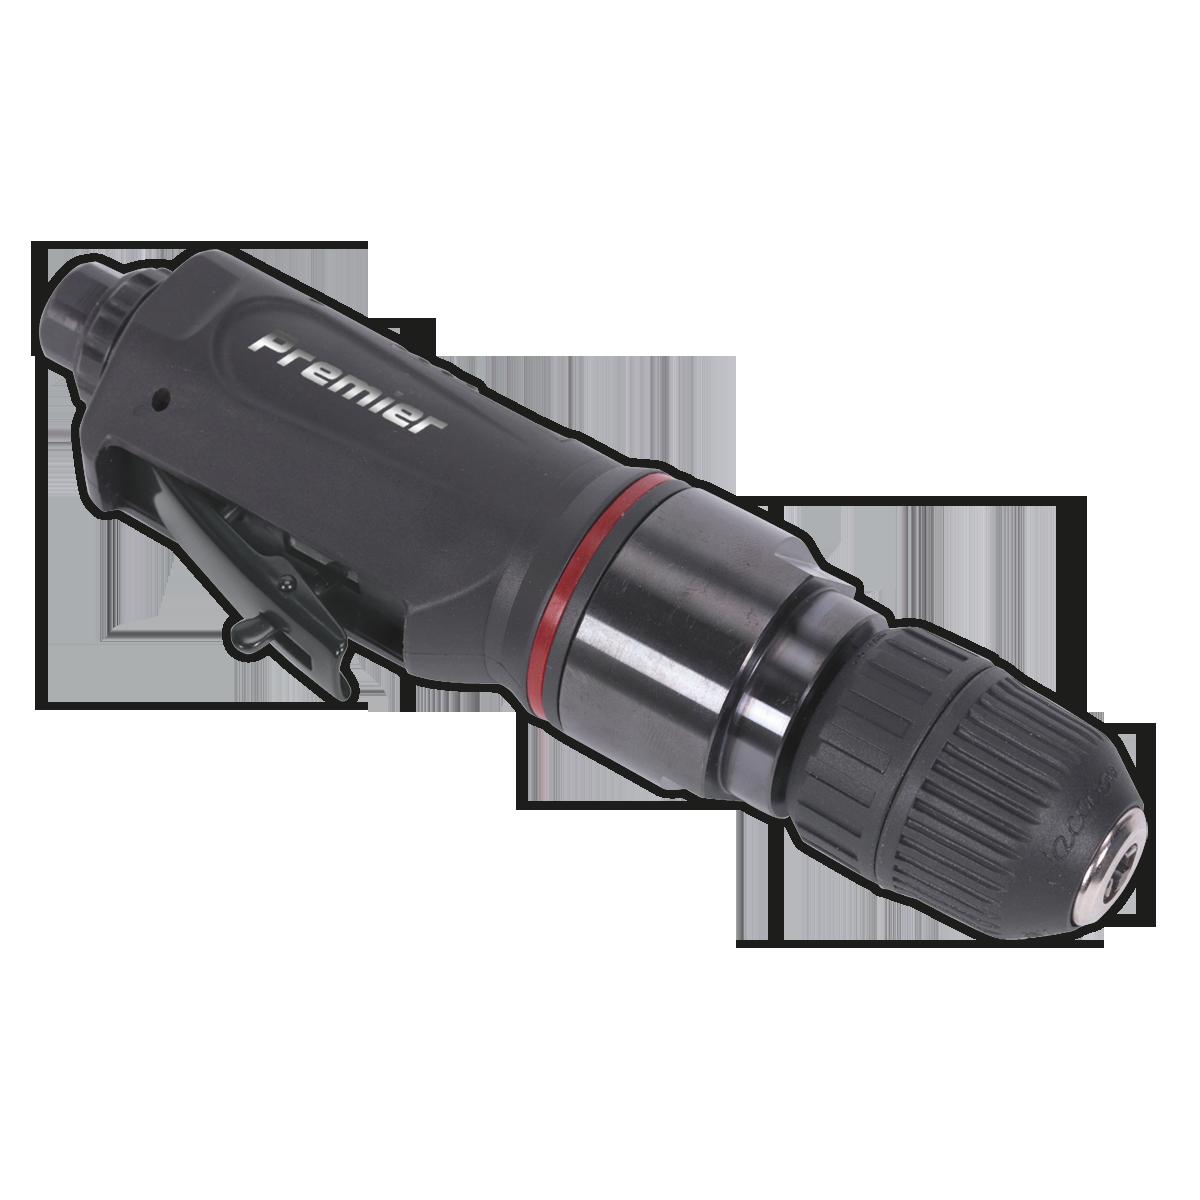 Air Drill Straight with Ø10mm Keyless Chuck Premier